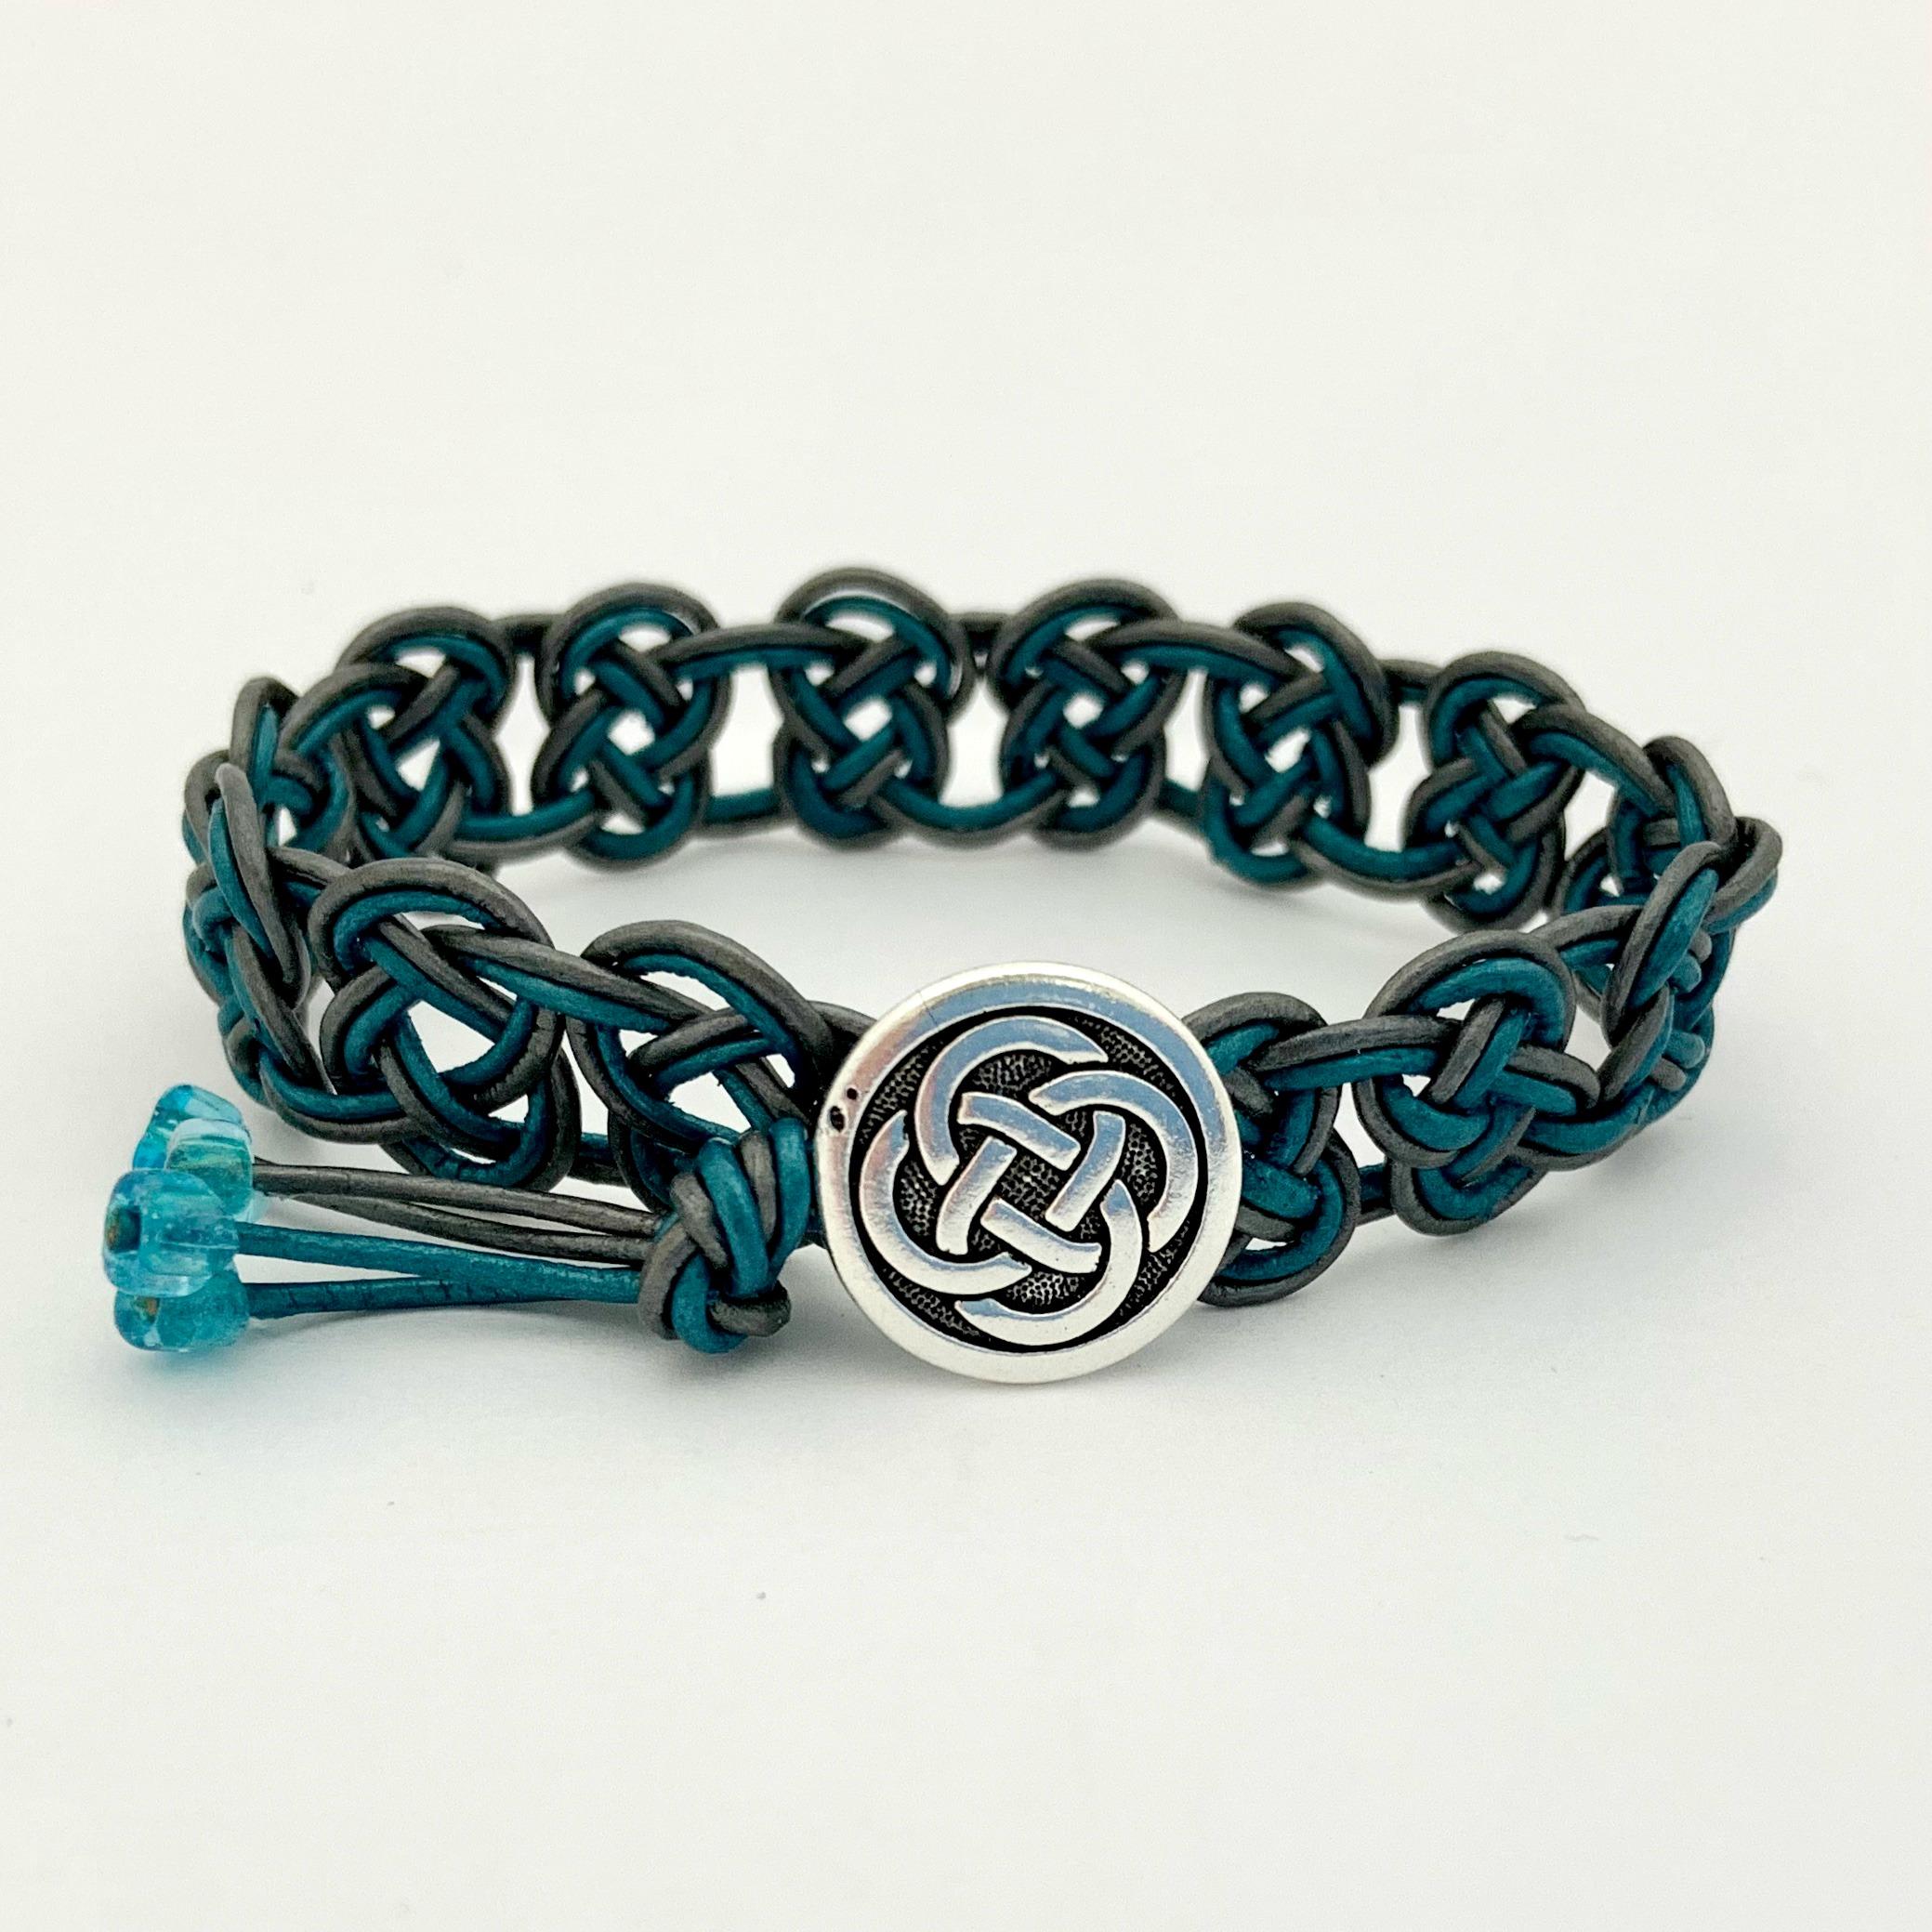 Celtic Knot Bracelet Kit 2 Strand Let S Bead